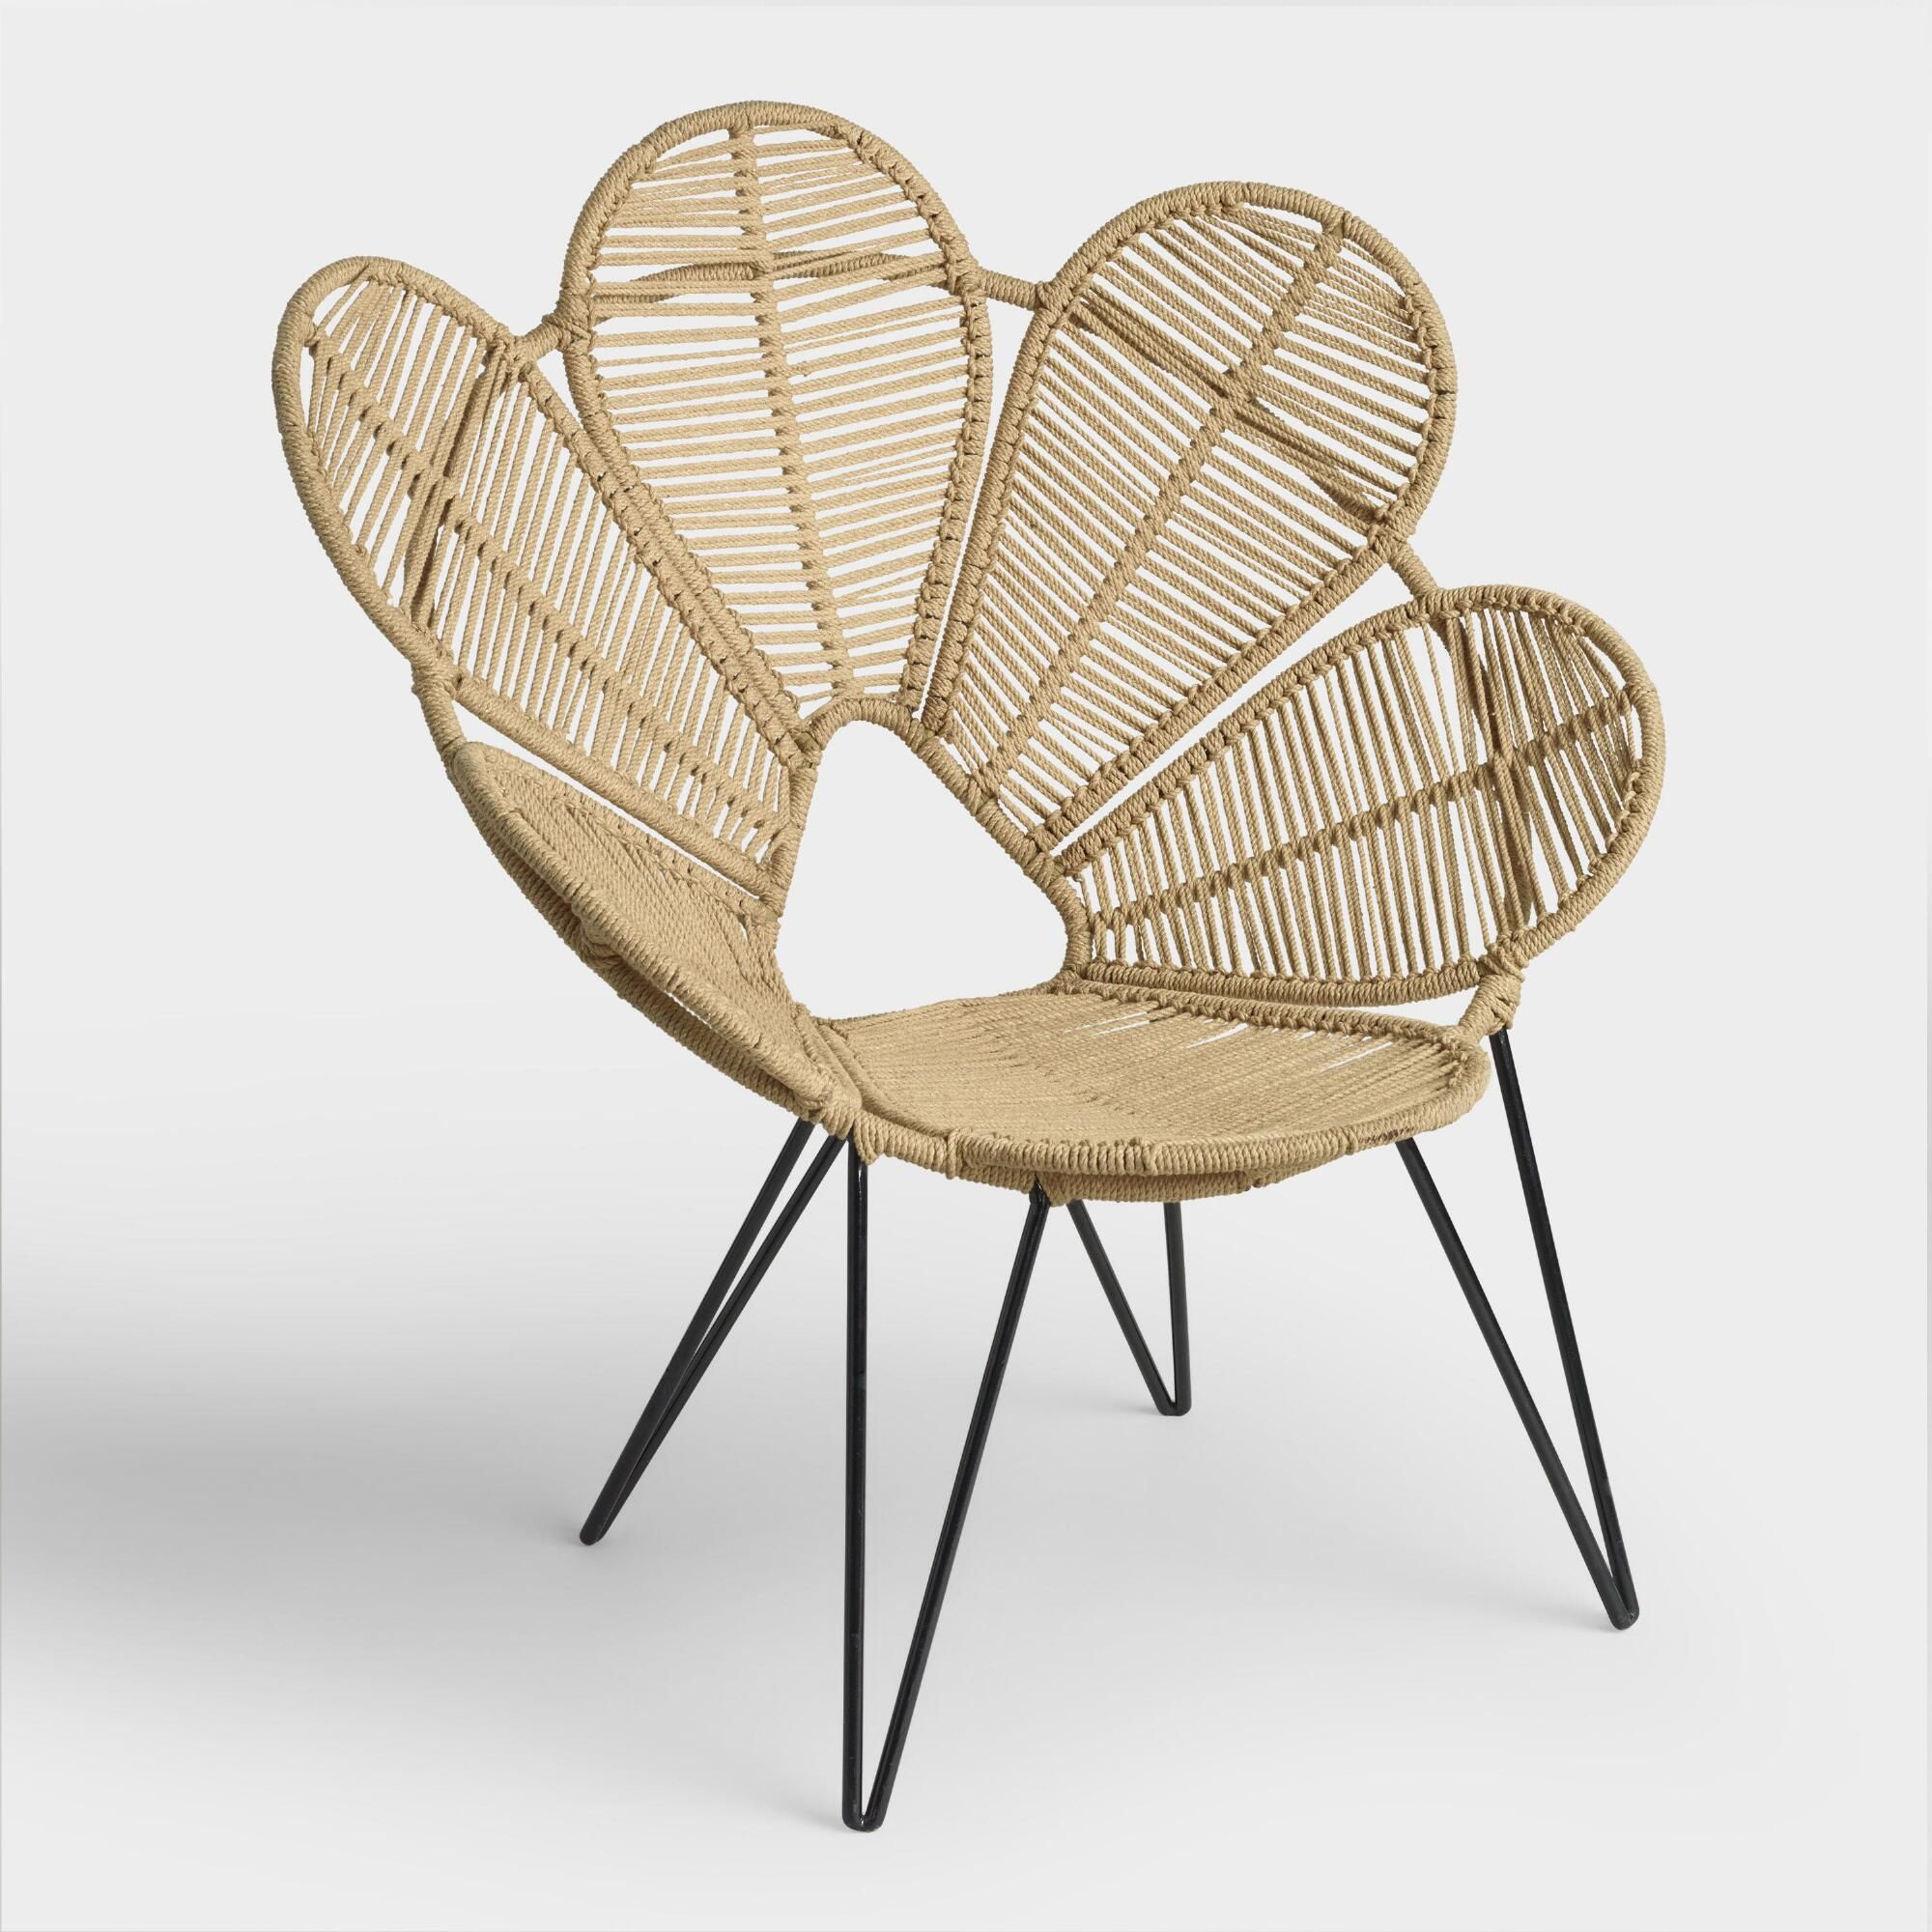 Jute flower chair by world market